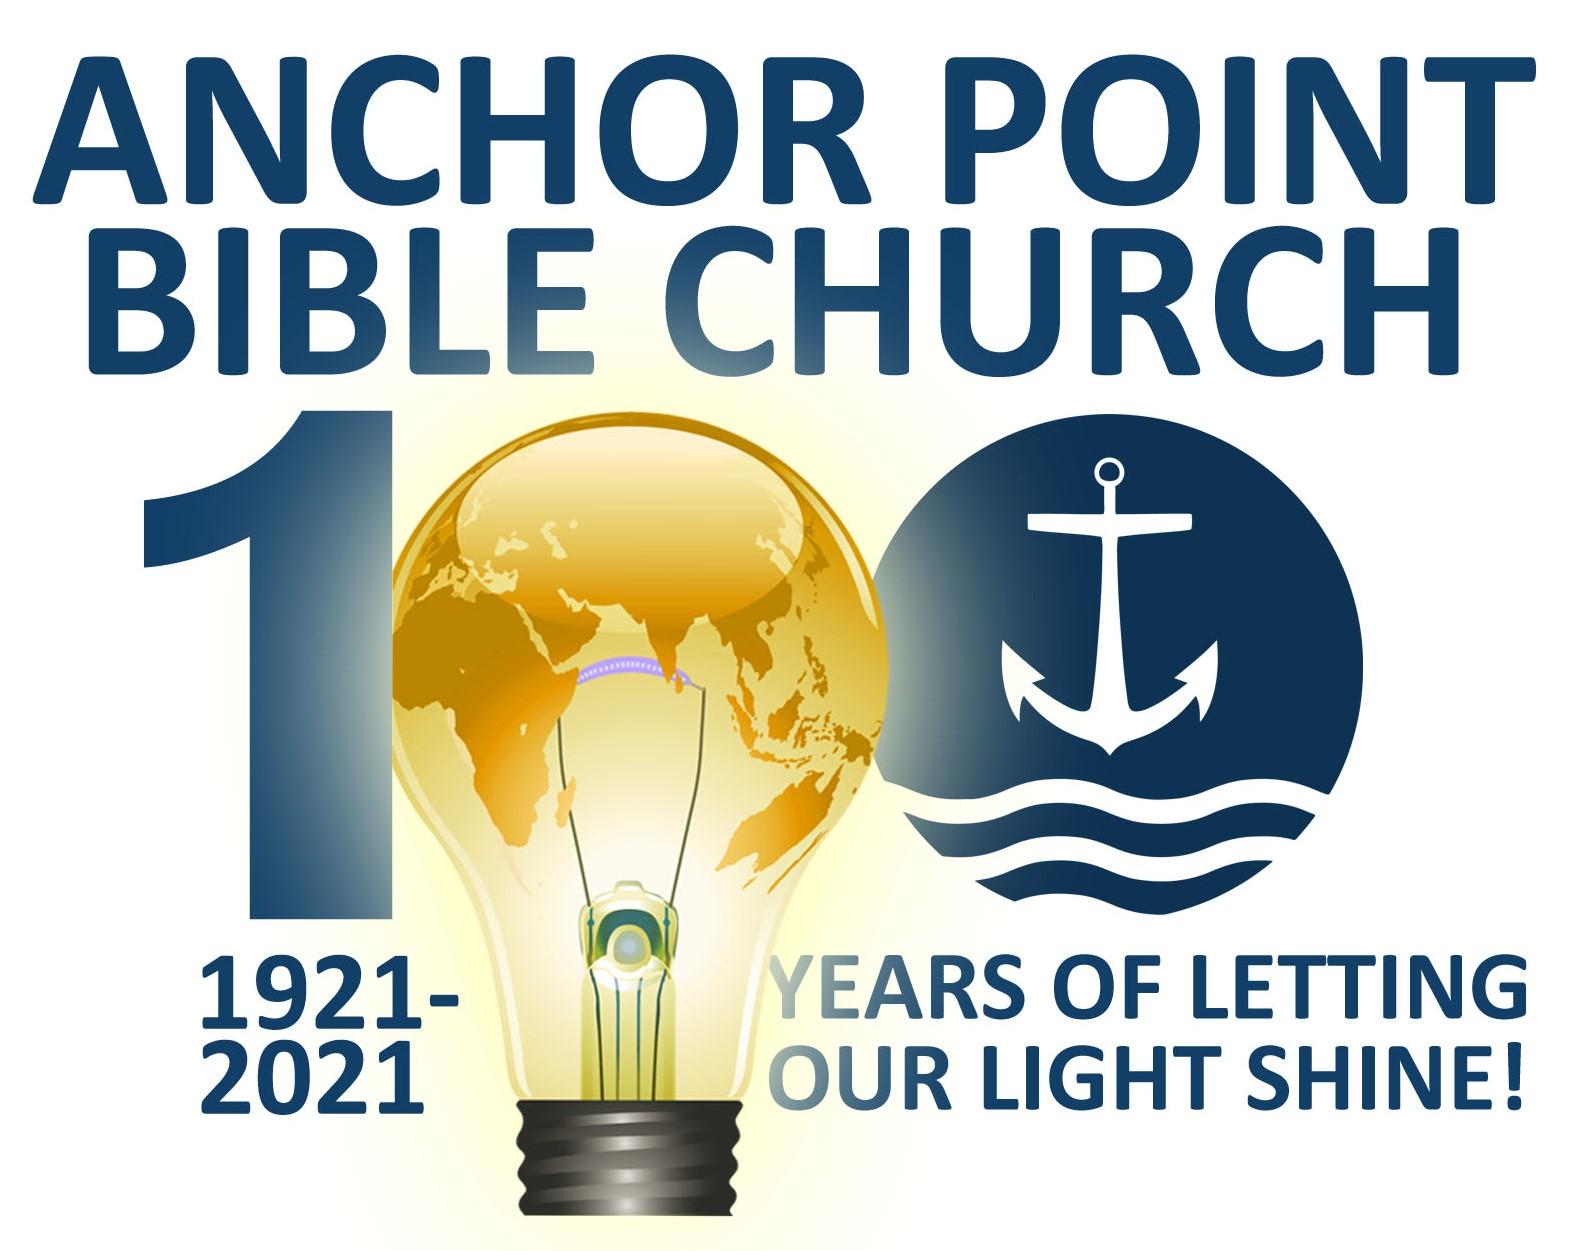 Anchor Point Bible Church